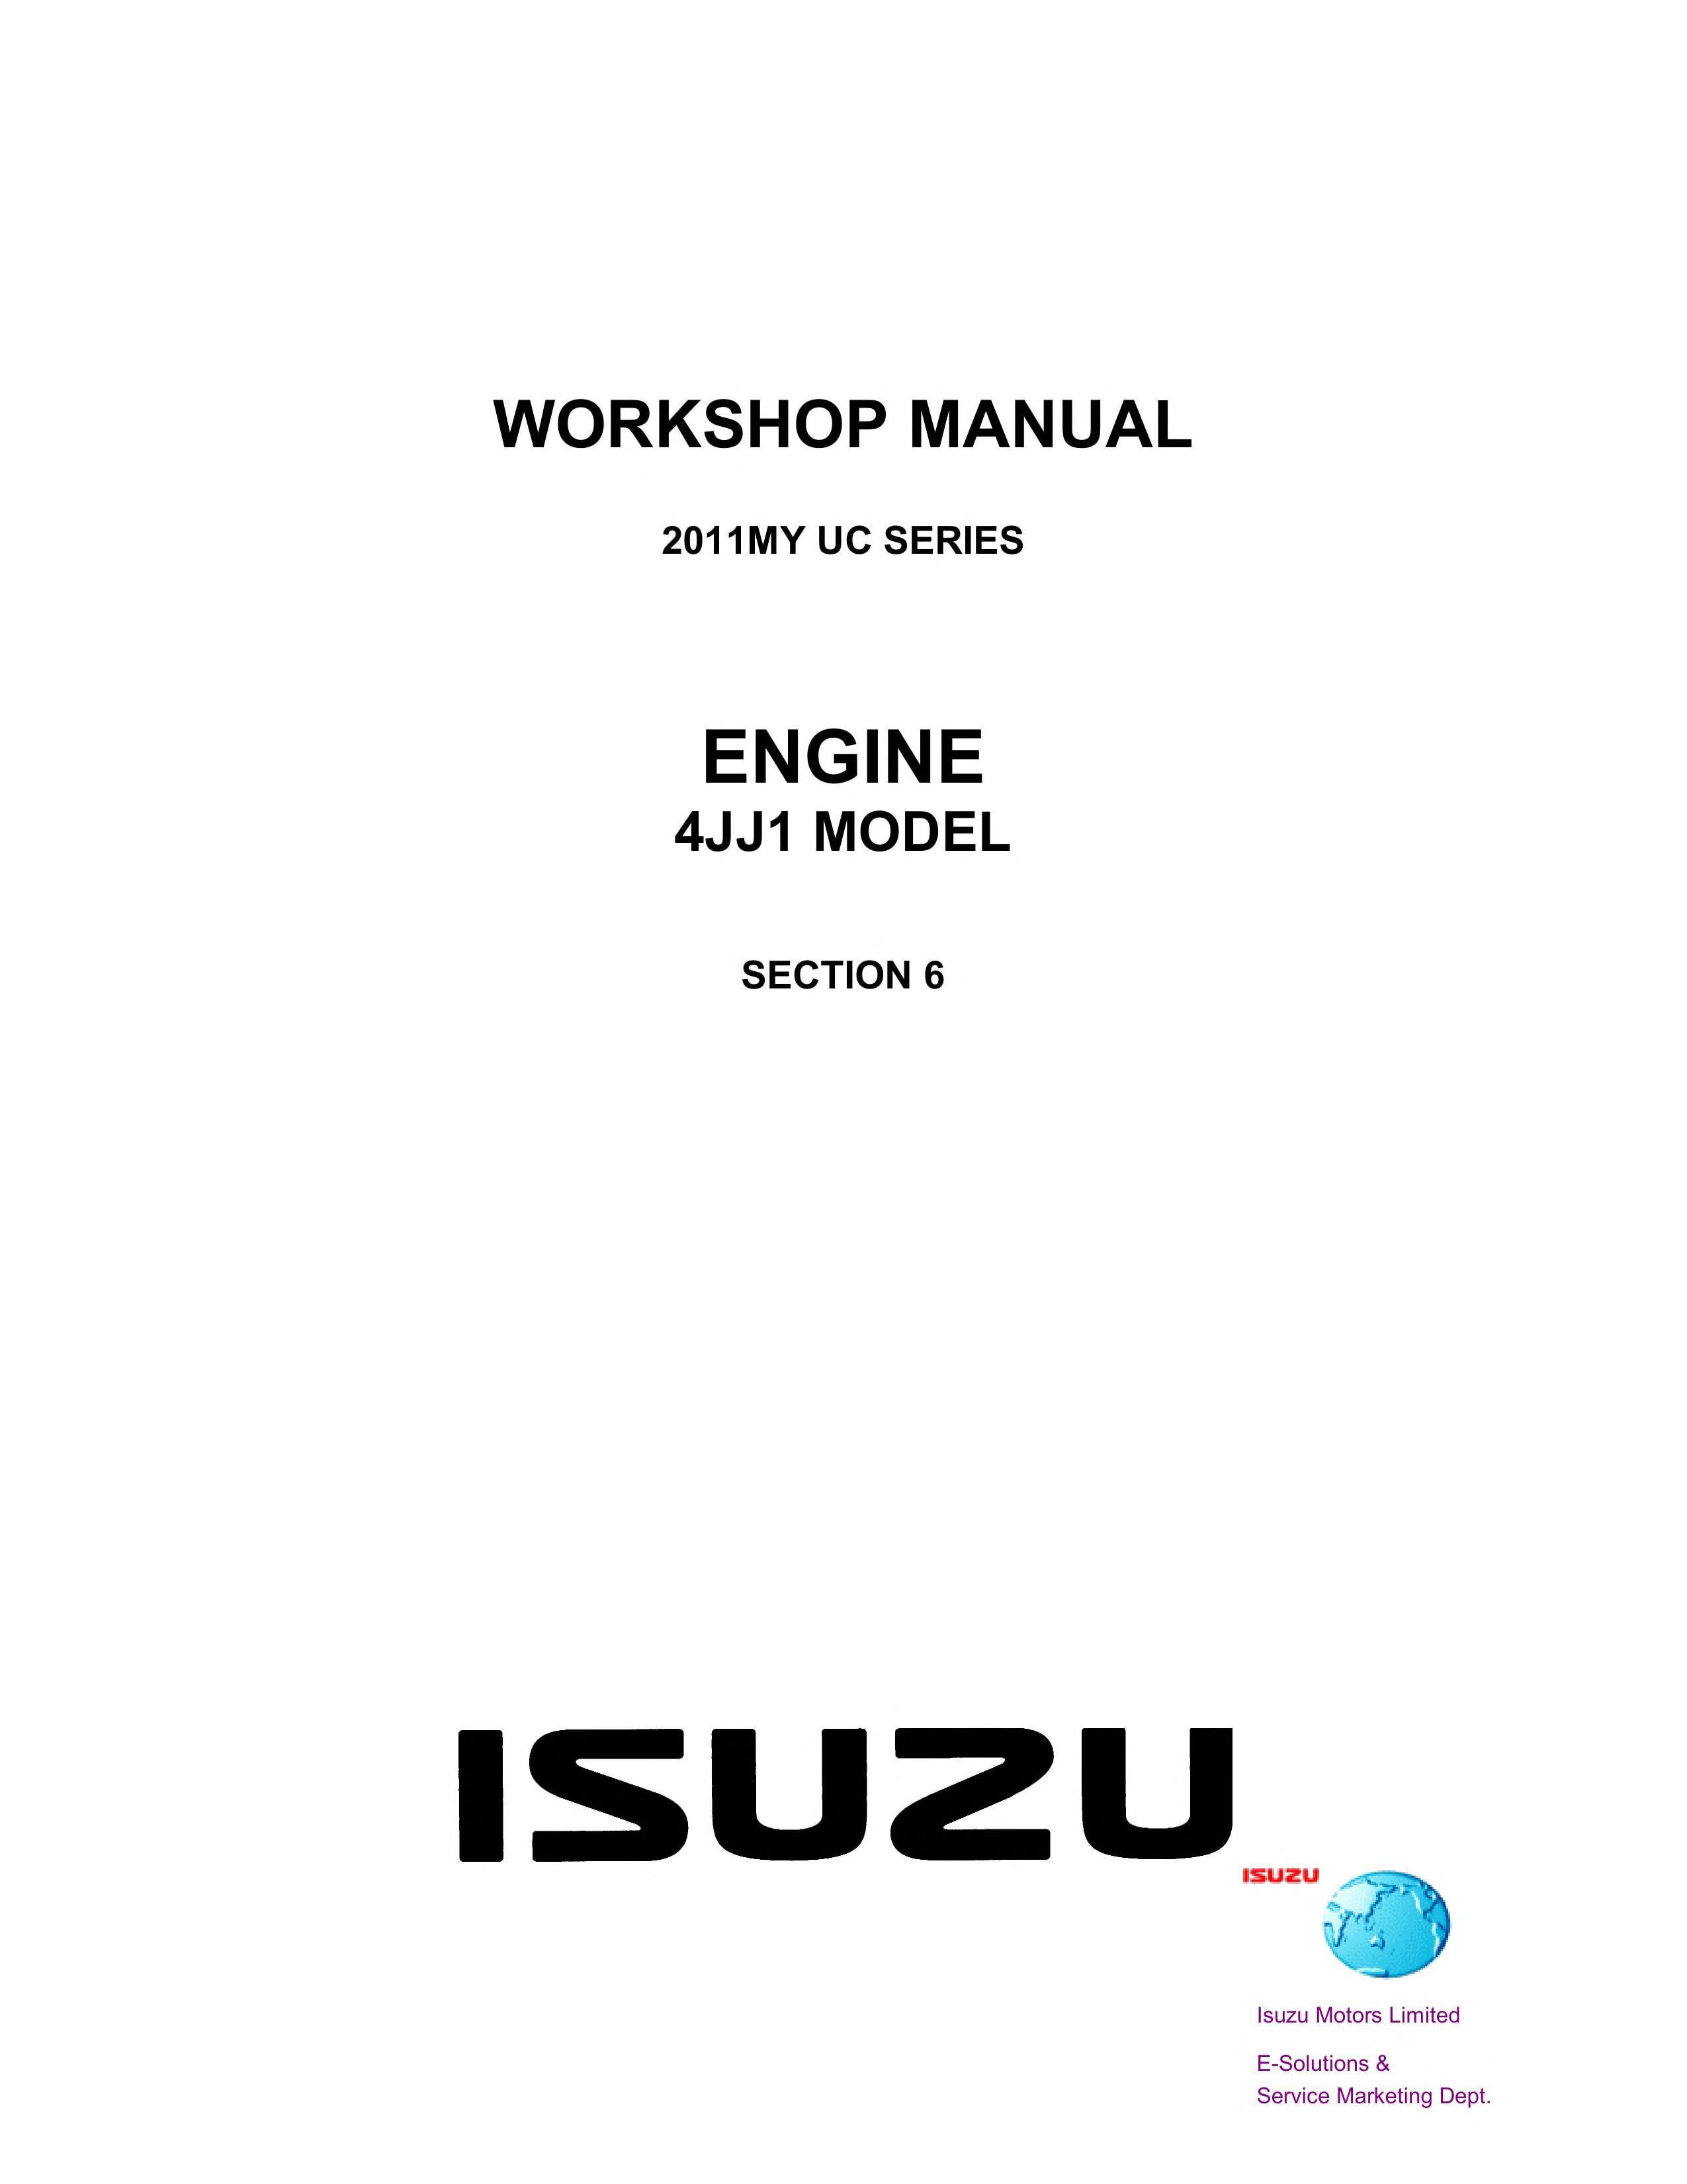 hight resolution of isuzu d max 2011 4jj1 engine service manual pdf pdfy mirror free download borrow and streaming internet archive